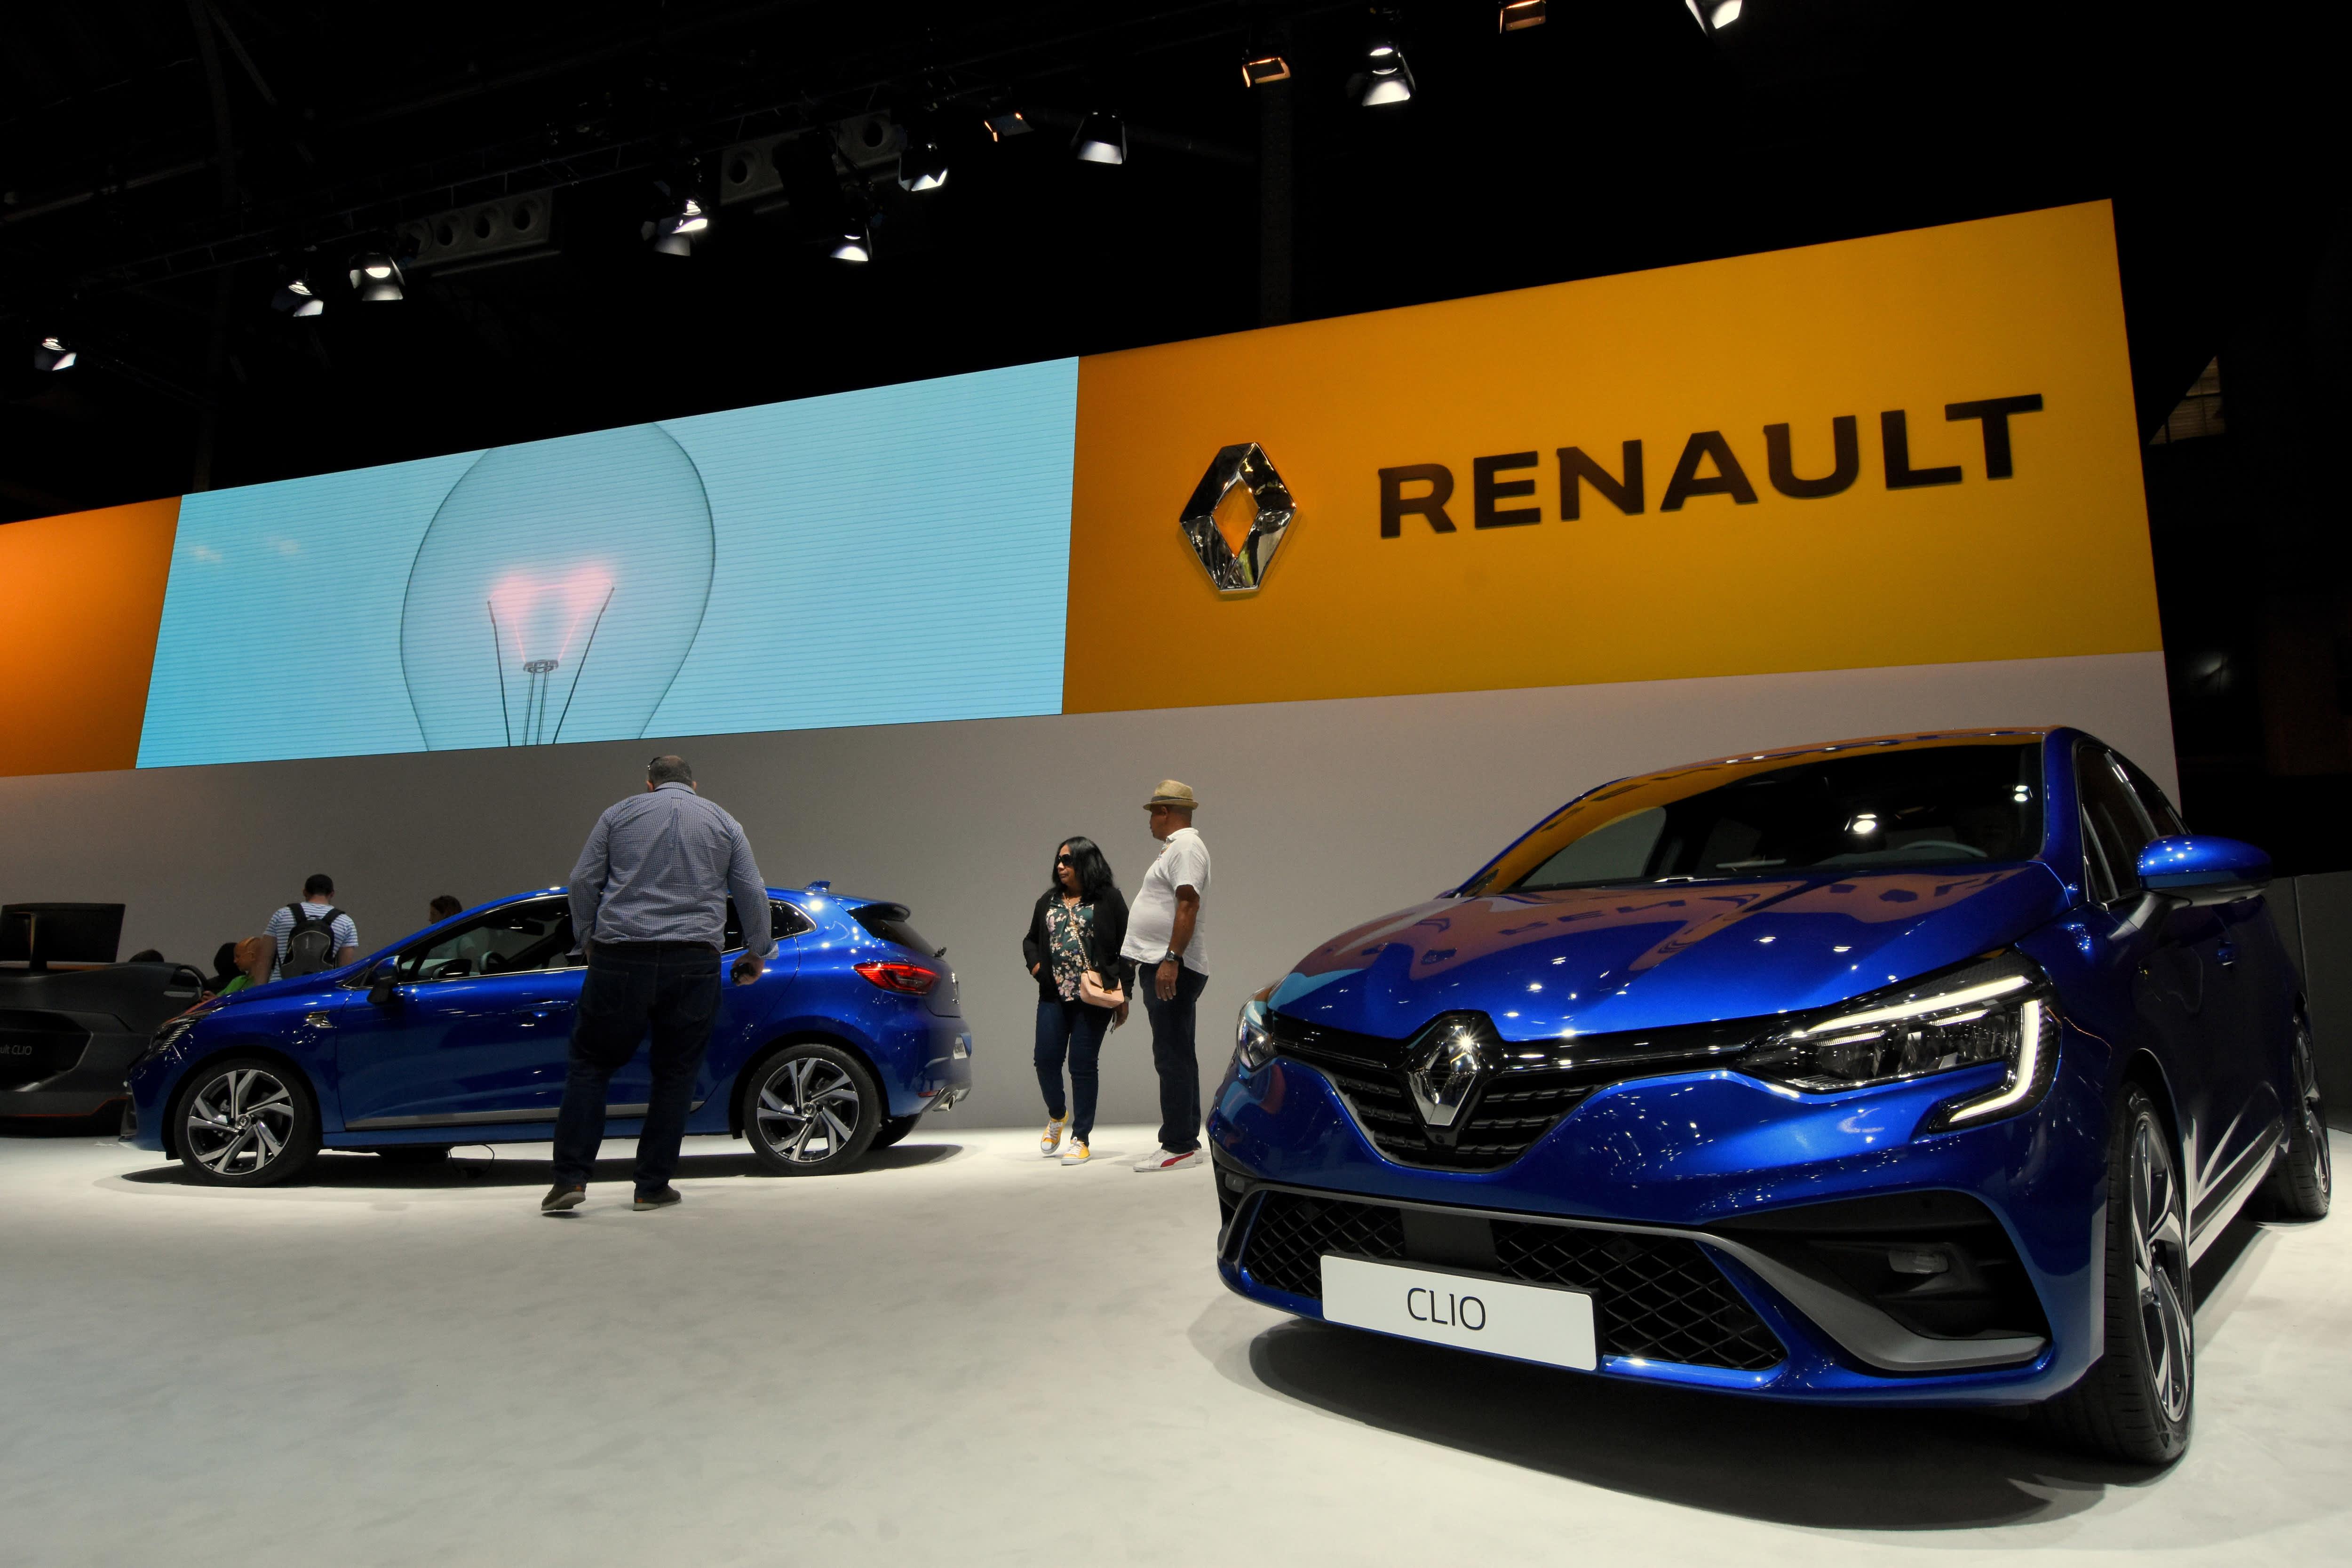 Renault cuts revenue goal after weaker first half